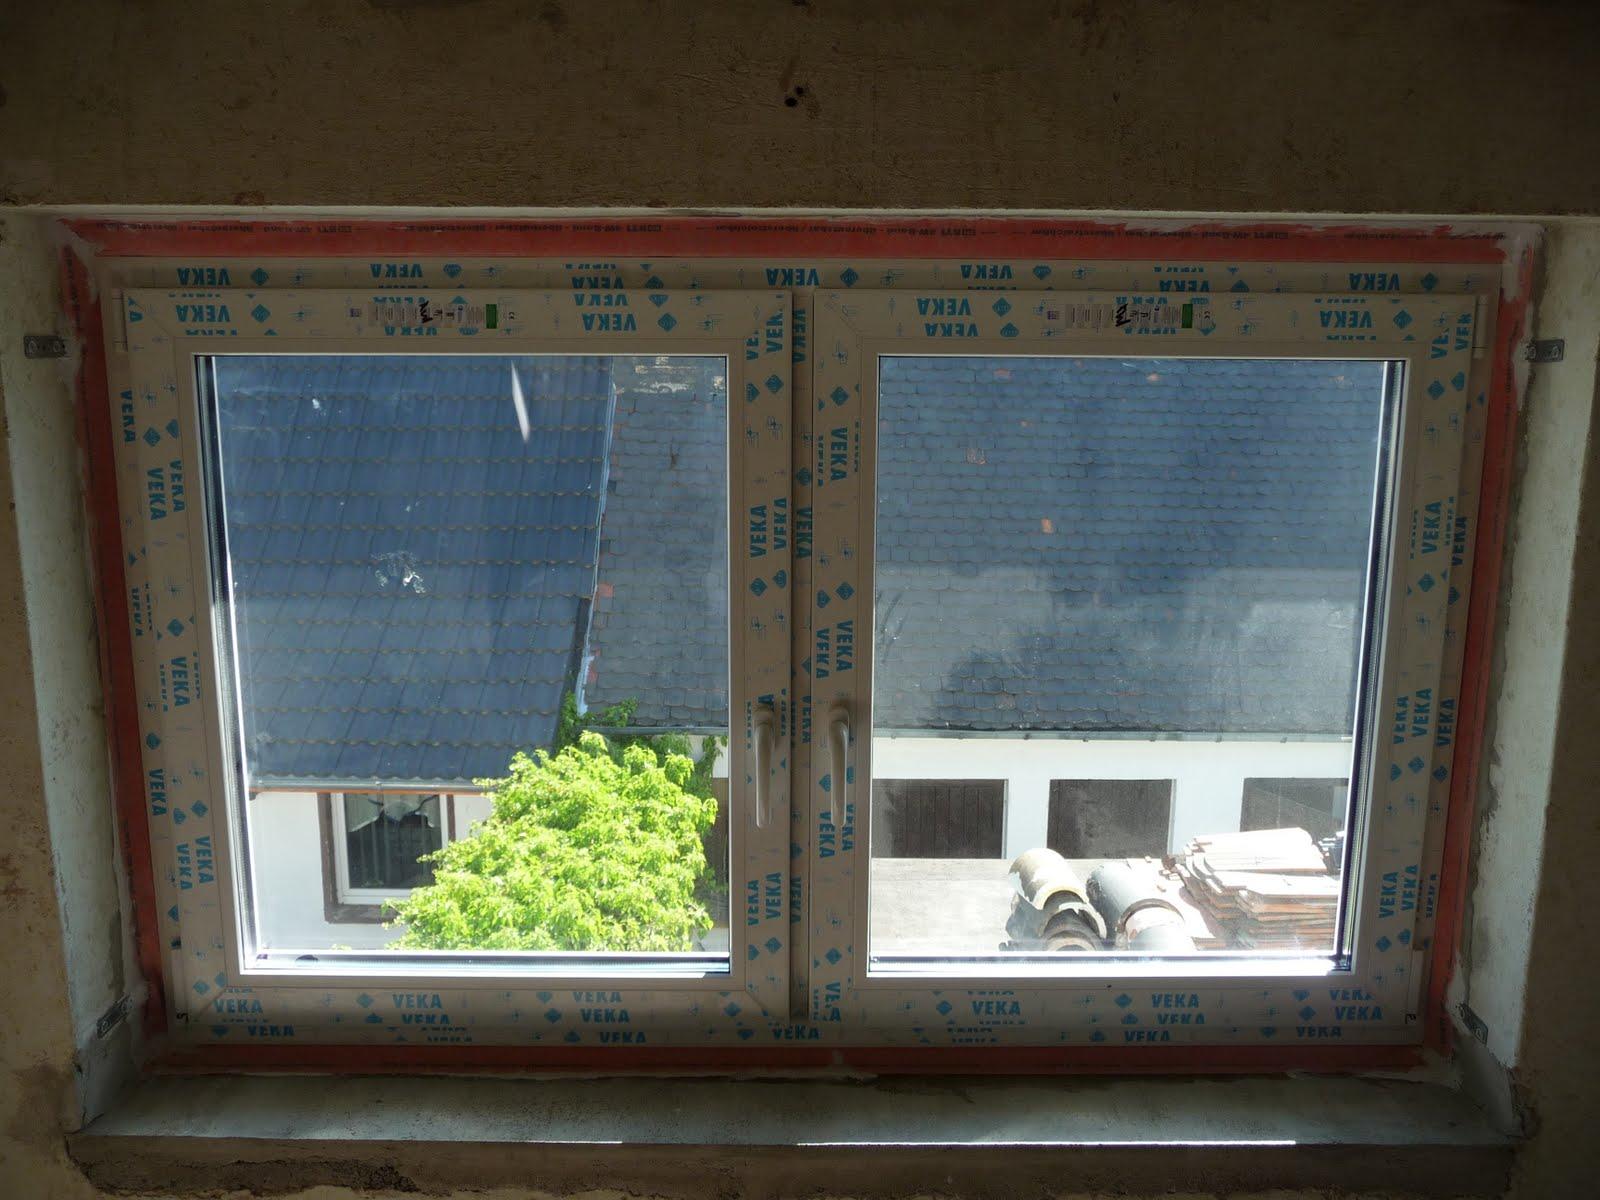 Lbs2 so wird gebaut fenster wechsel dich - Fenster uw wert ...